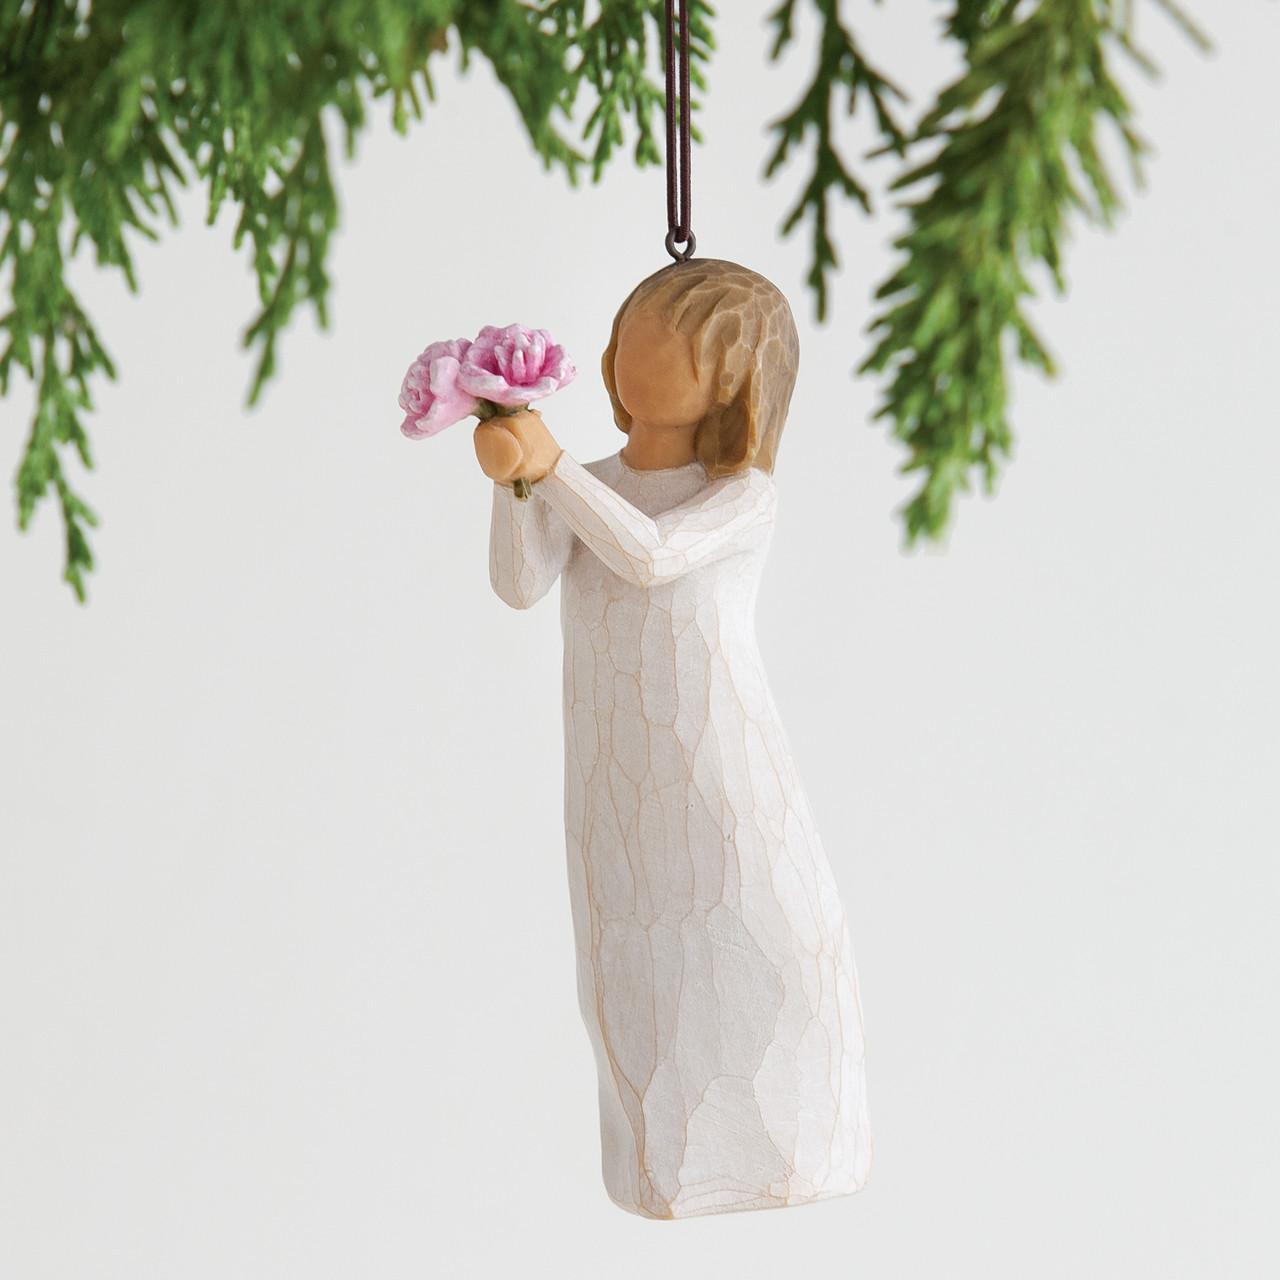 Demdaco 2019 Willow Tree Ornament